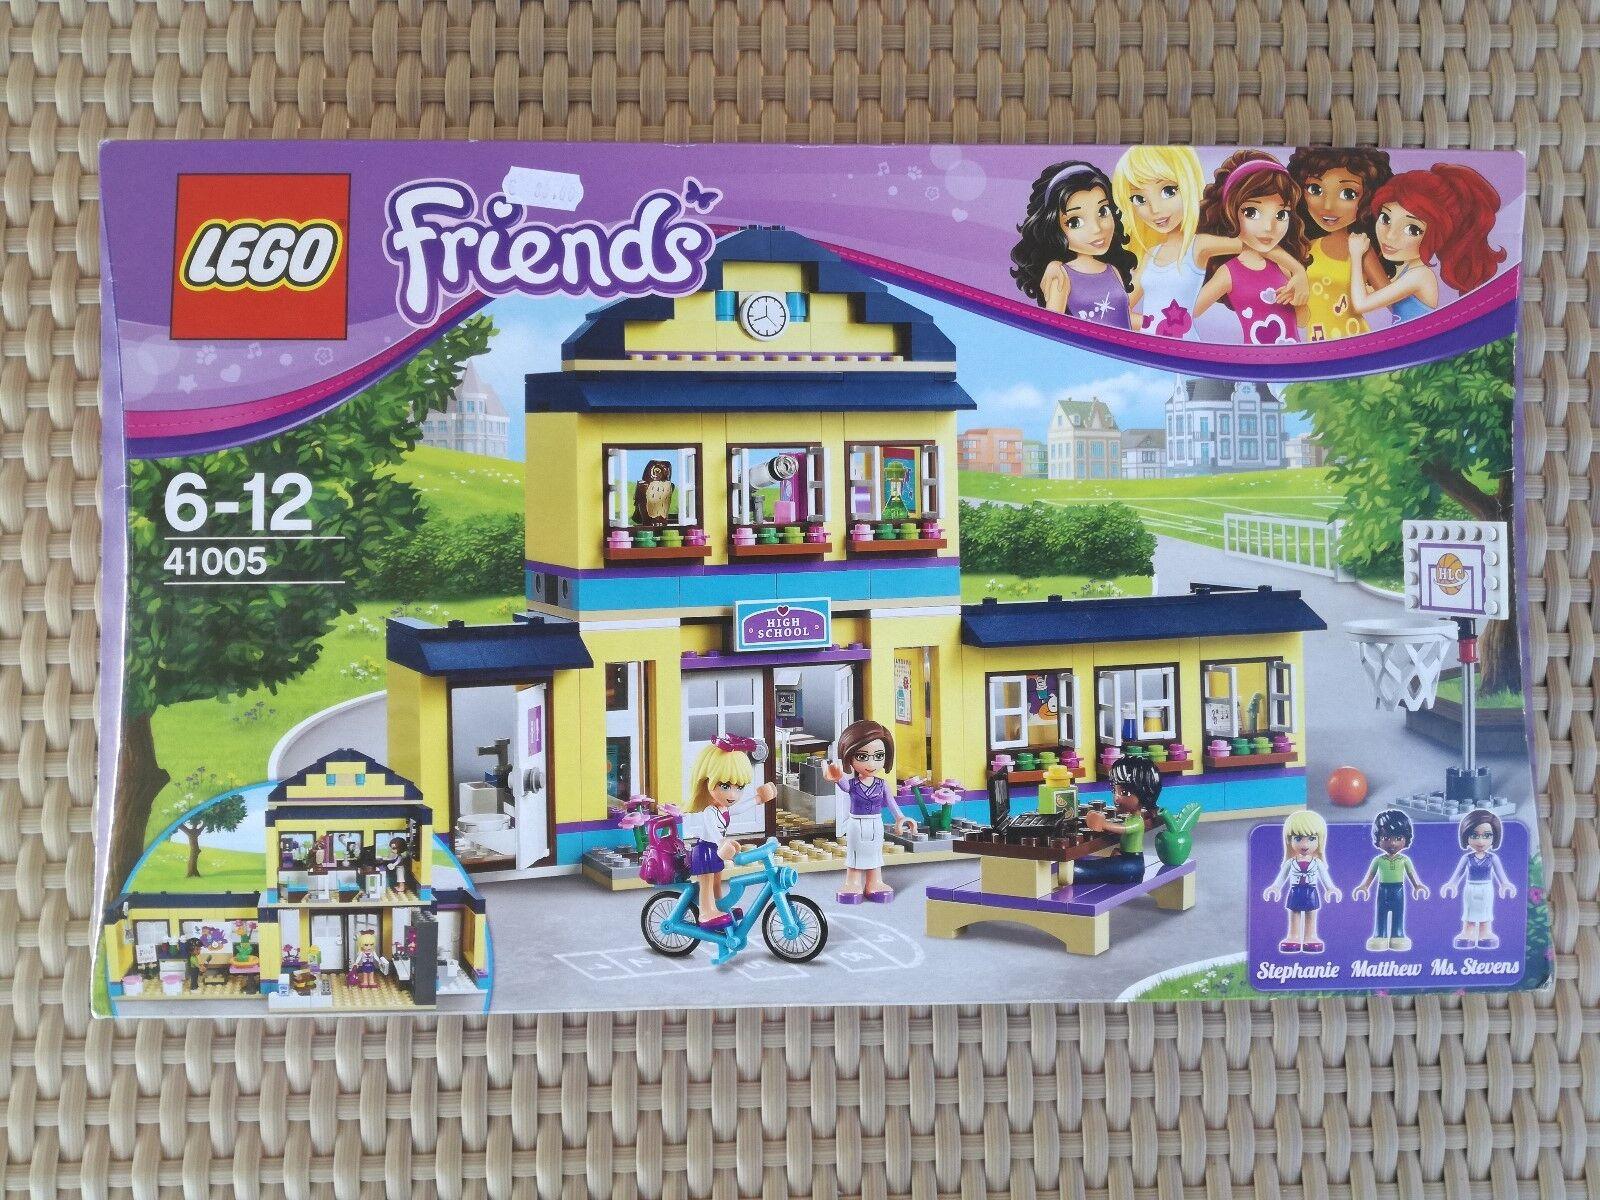 Lego Friends Heartlake High School 41005 NIB - Box And Instructions